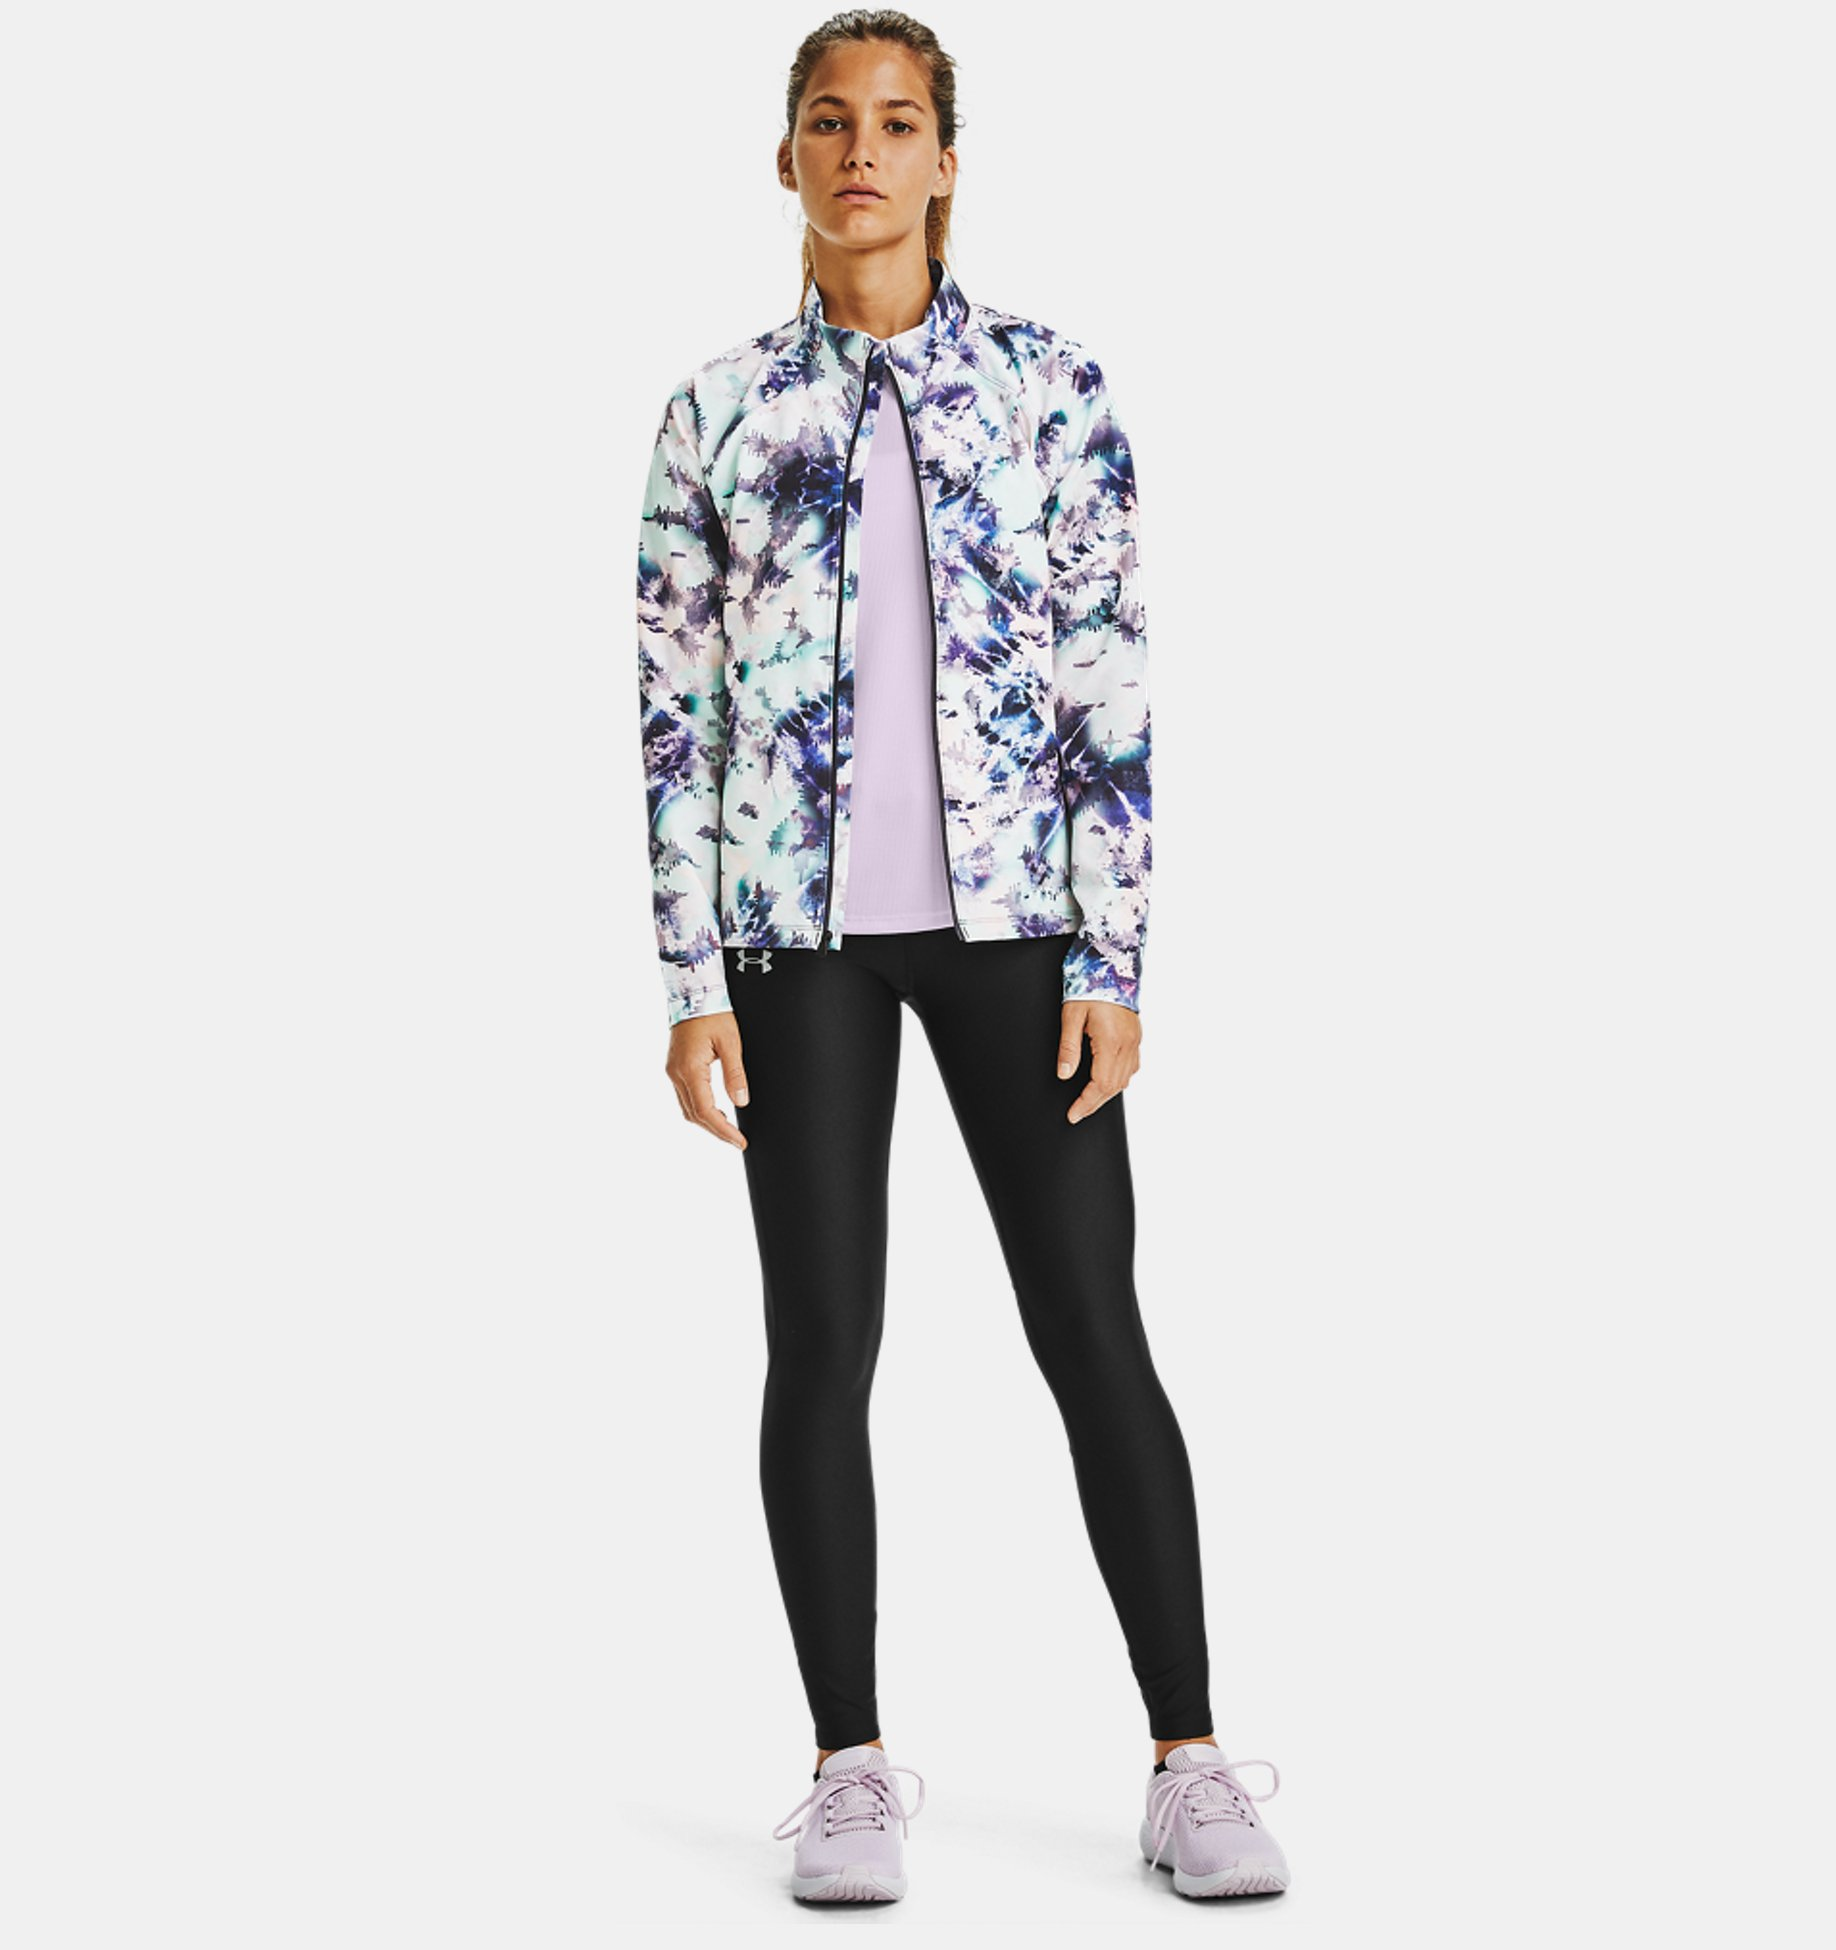 hemisferio arroz lema  Women's UA Storm Launch 3.0 Printed Jacket | Under Armour BE